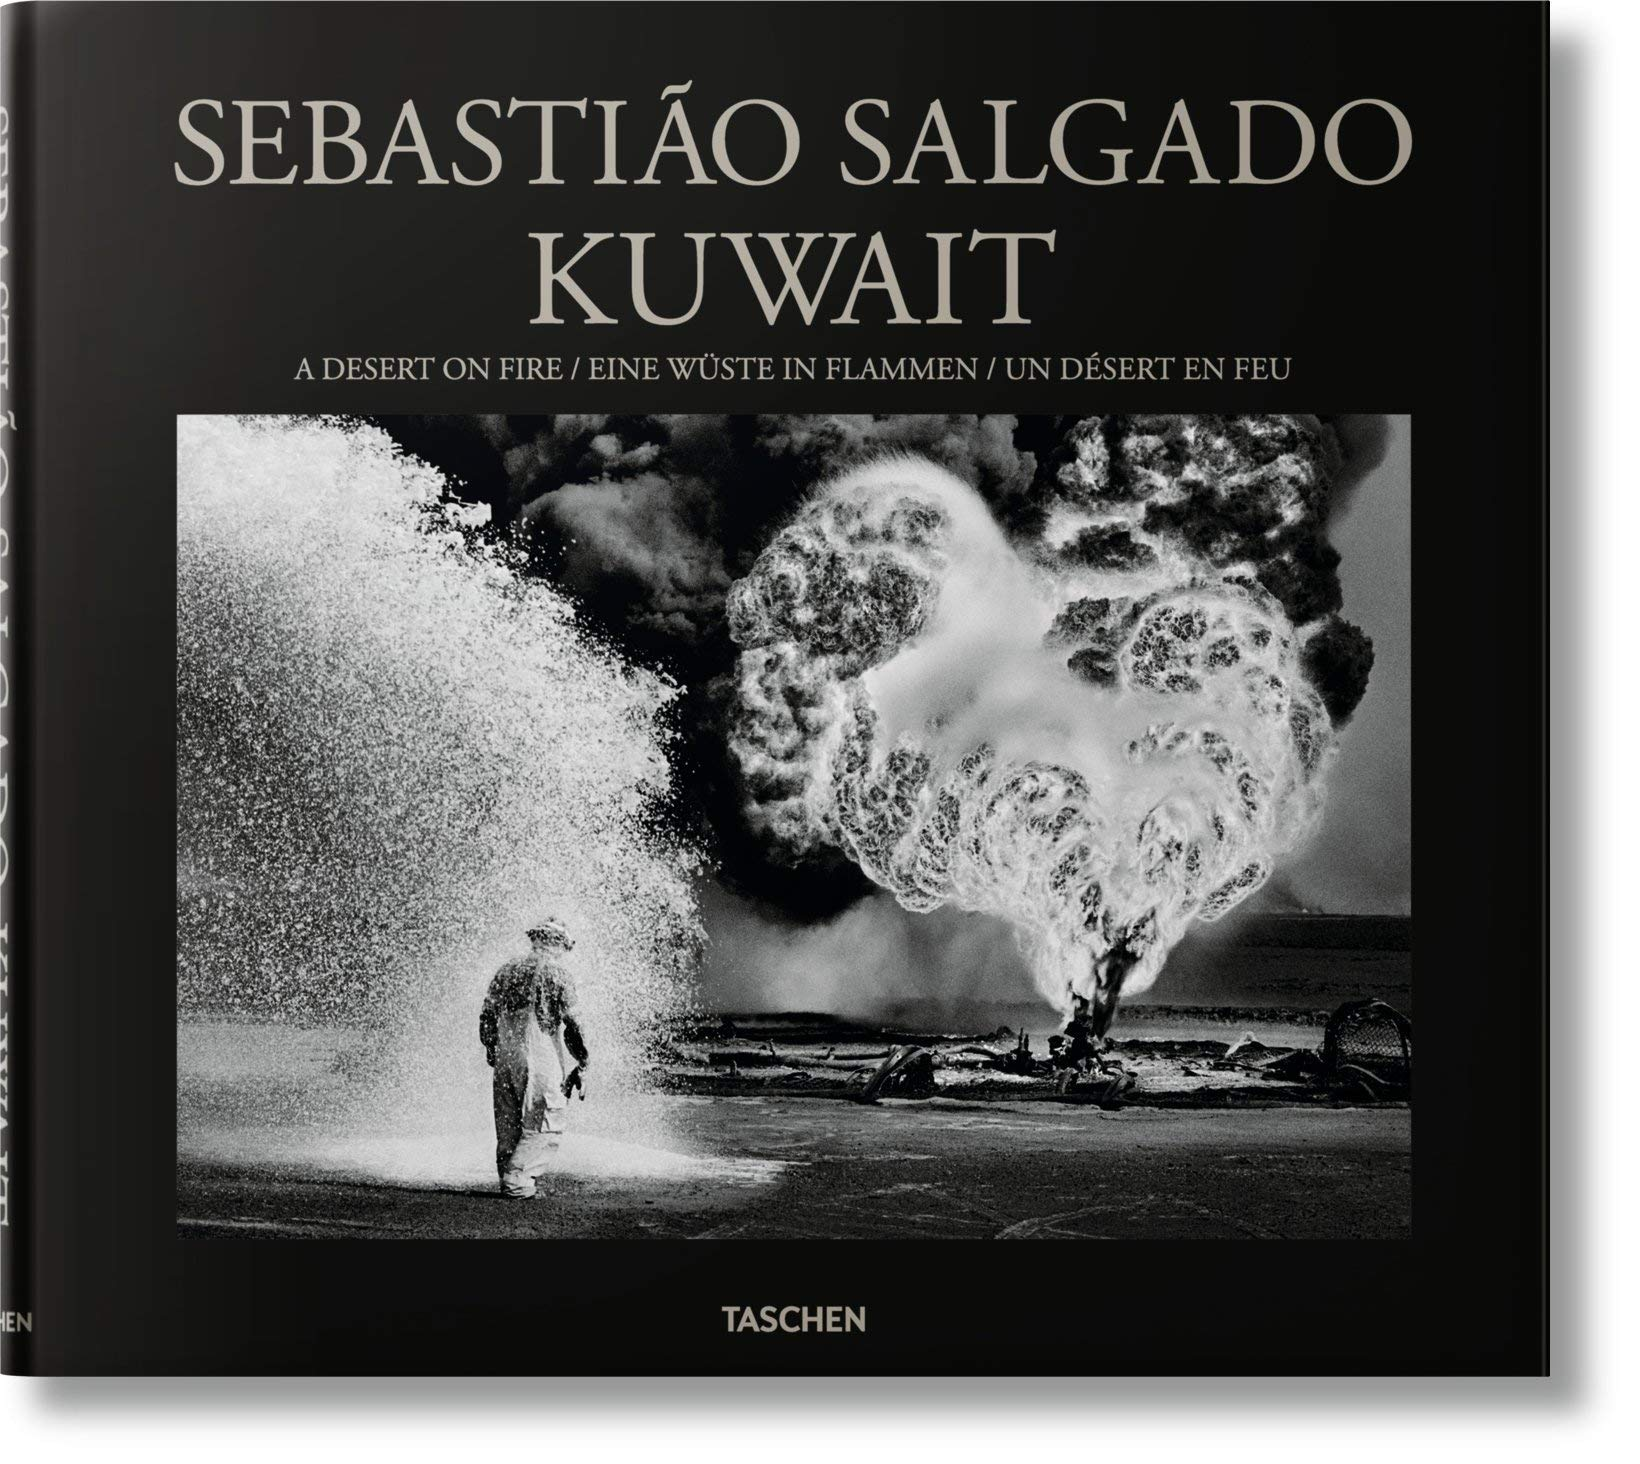 Fo Un Feu Salgado Desert Koweït Sebastiao En UMqjSzpVGL